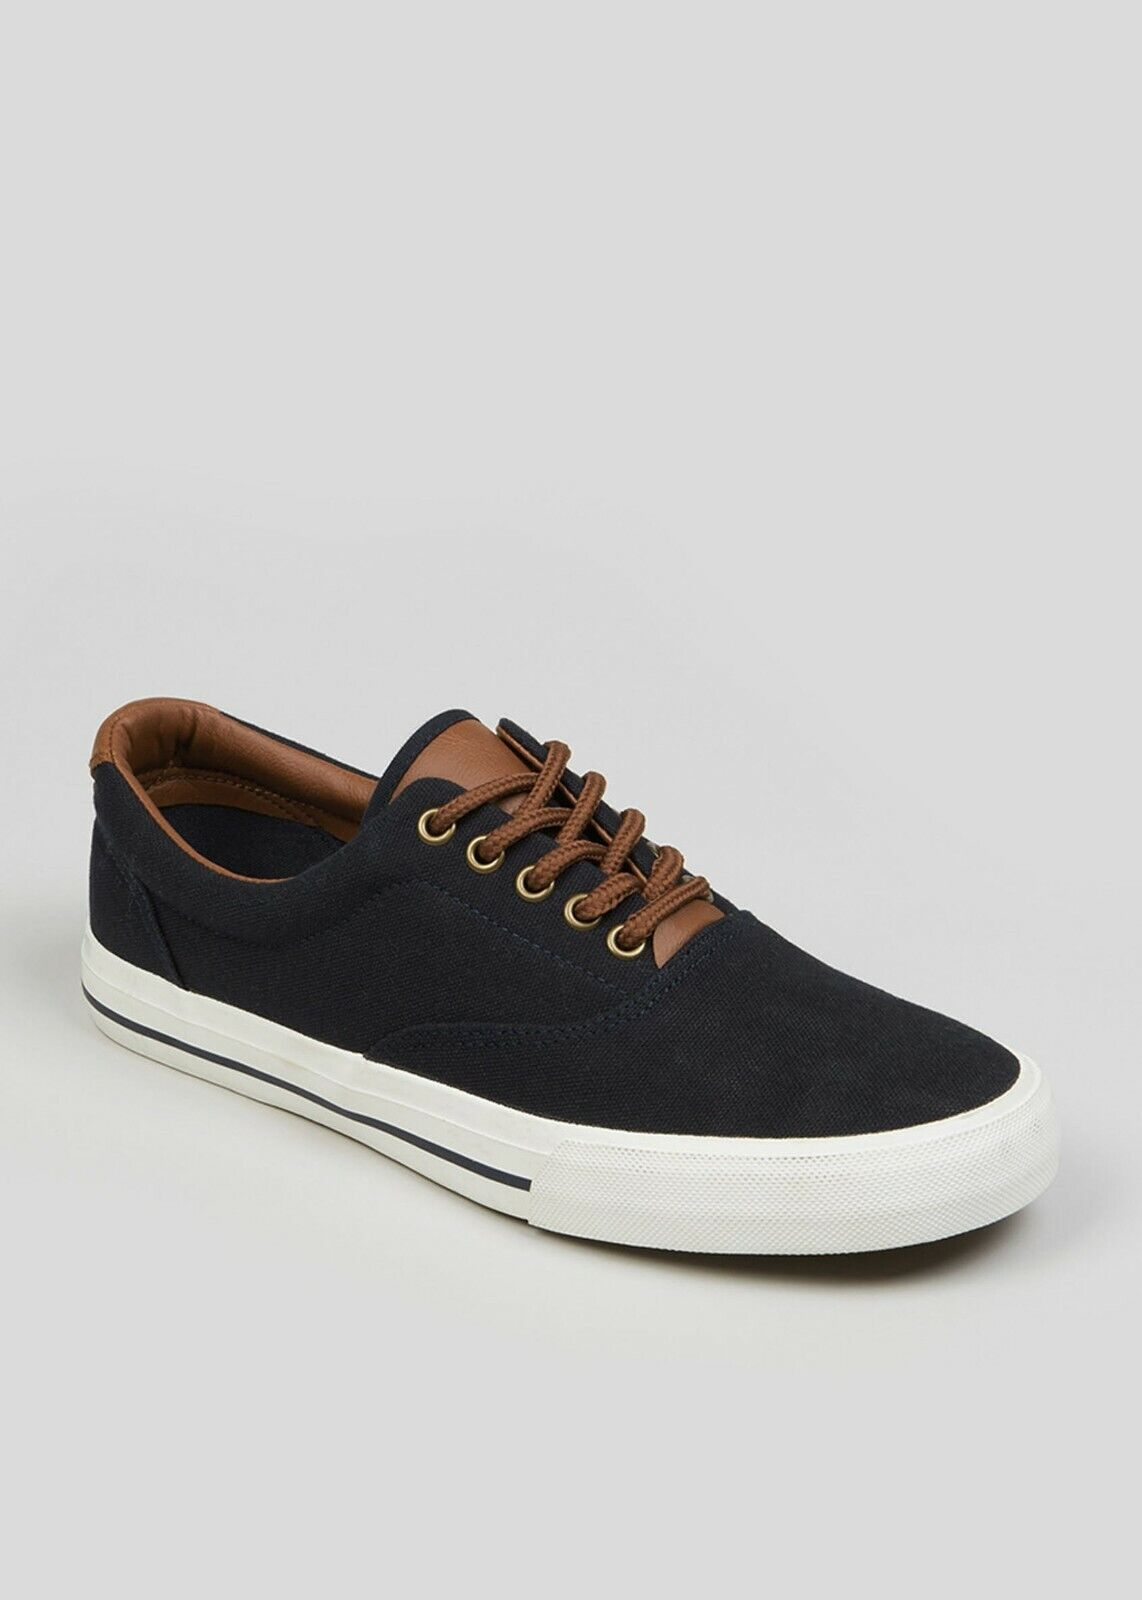 Men's Authentic Casual Footwear, Navy Plimsolls size 11/45.